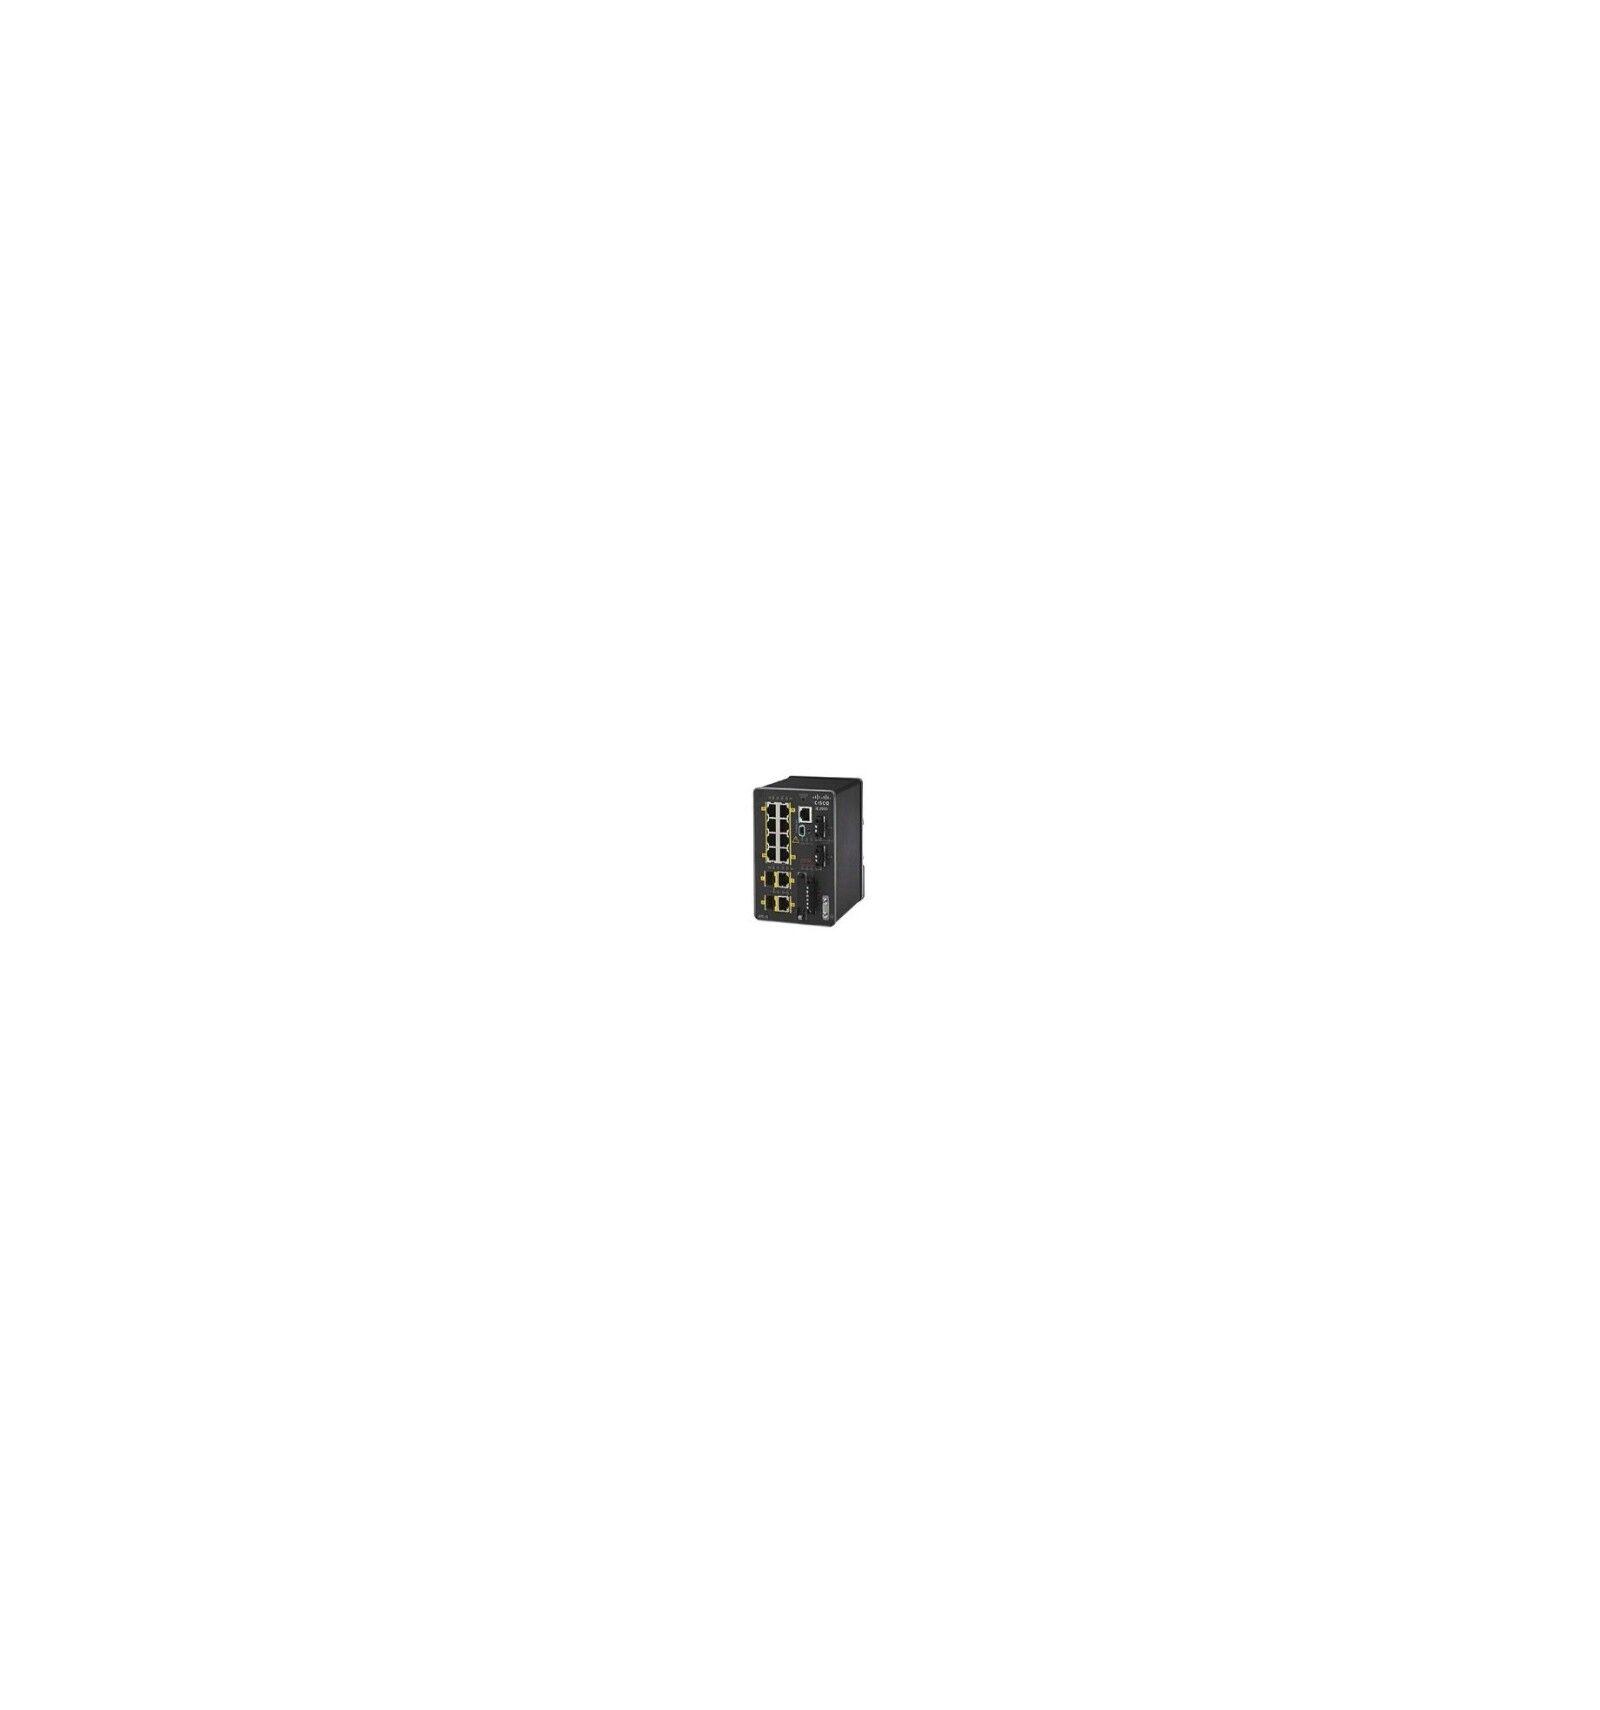 Cisco Systems IE-2000-8TC-L Managed network switch L2 Fast Ethernet (10/100) Musta verkkokytkin